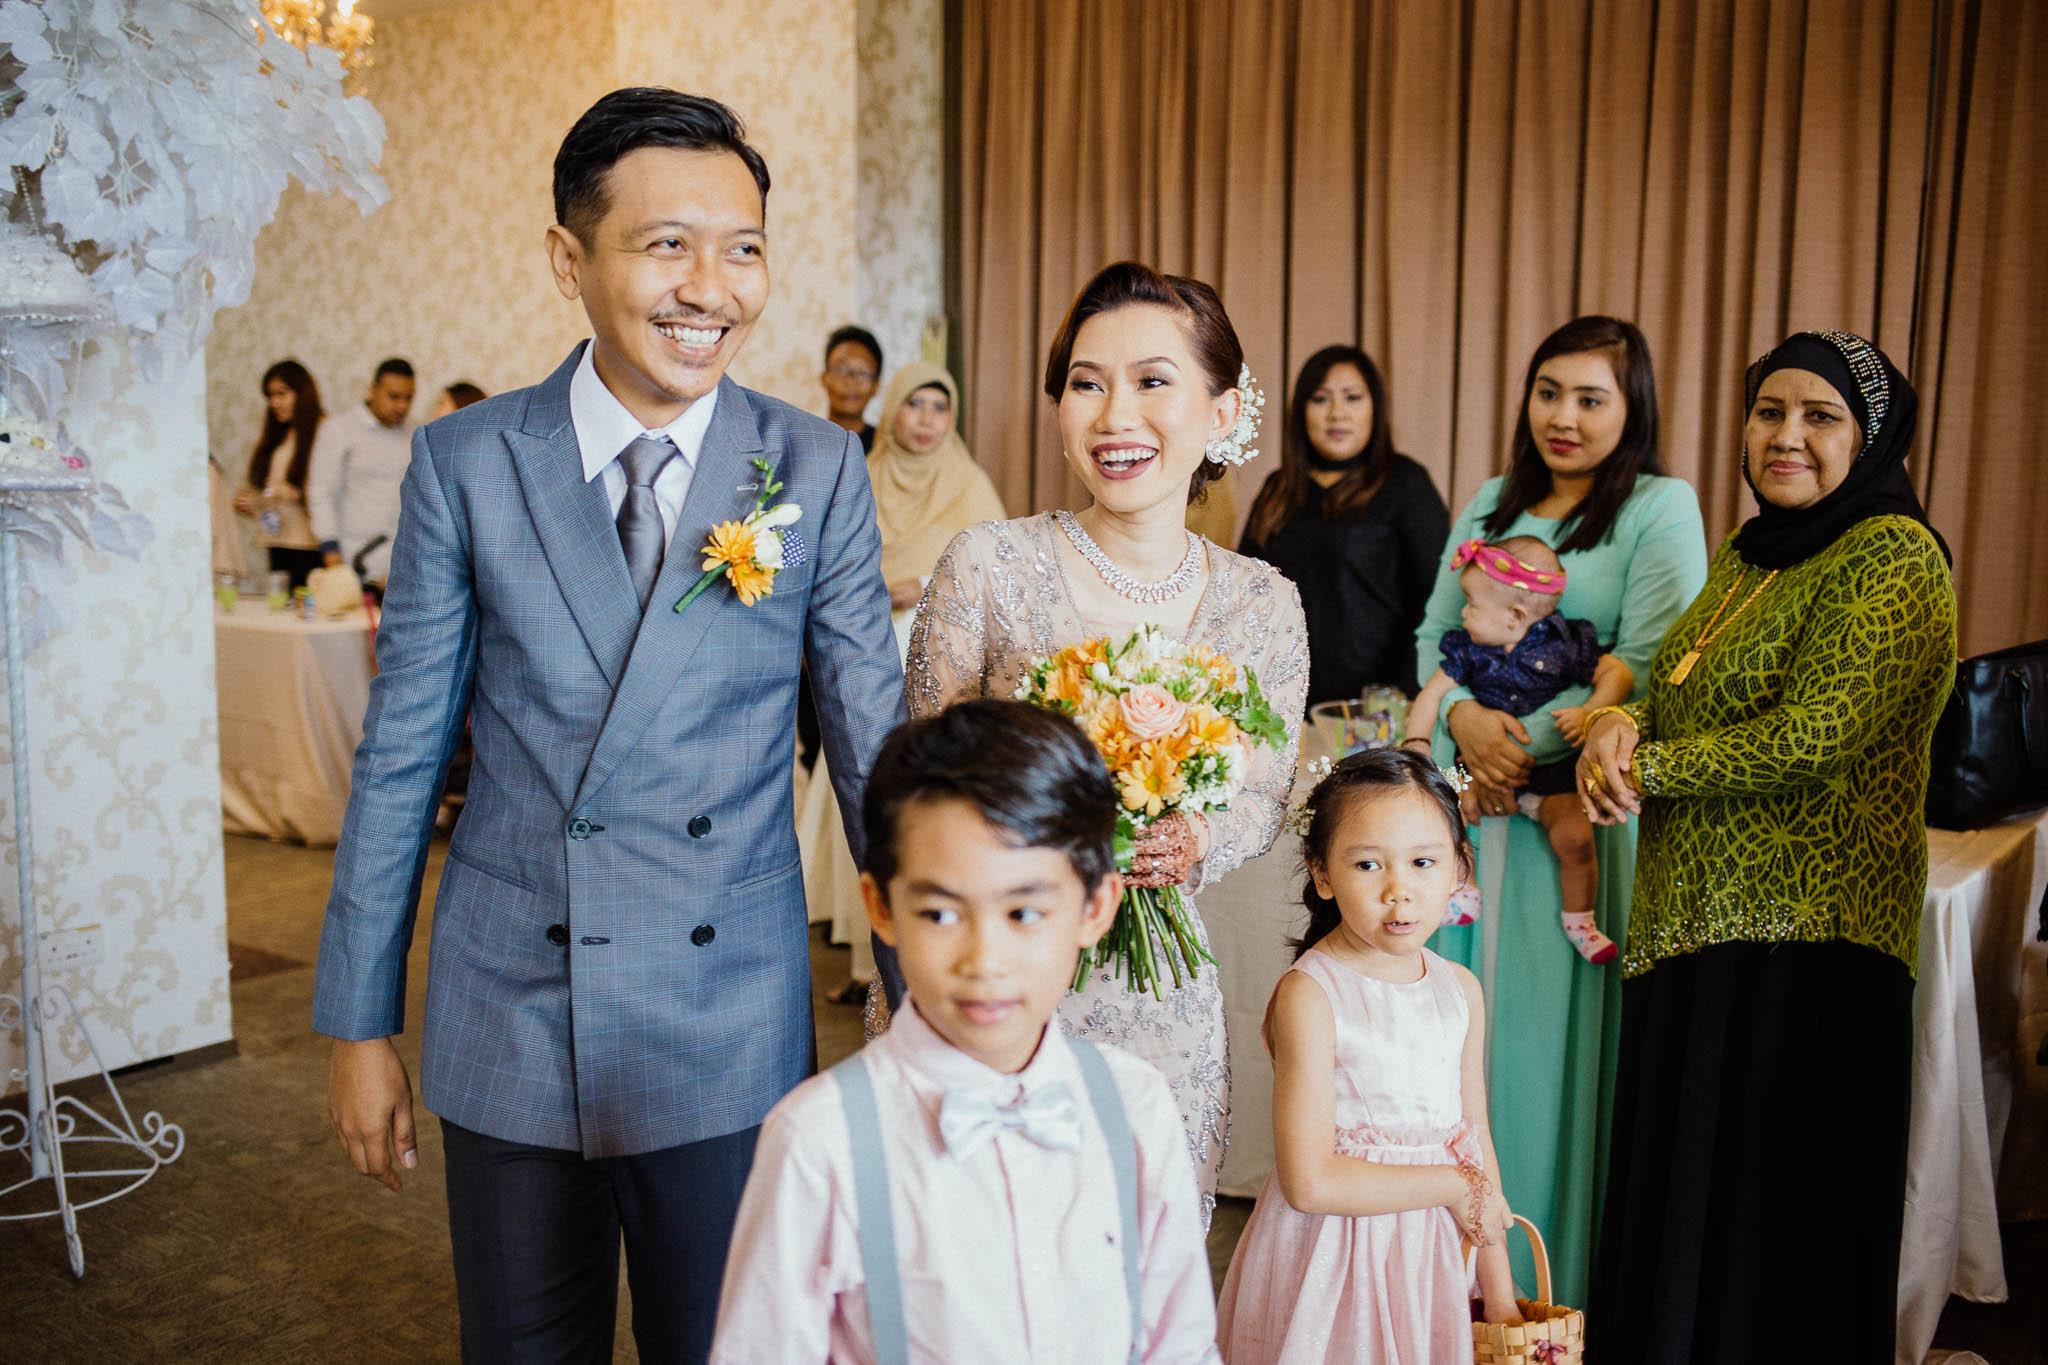 singapore-wedding-photographer-wedding-nufail-addafiq-045.jpg